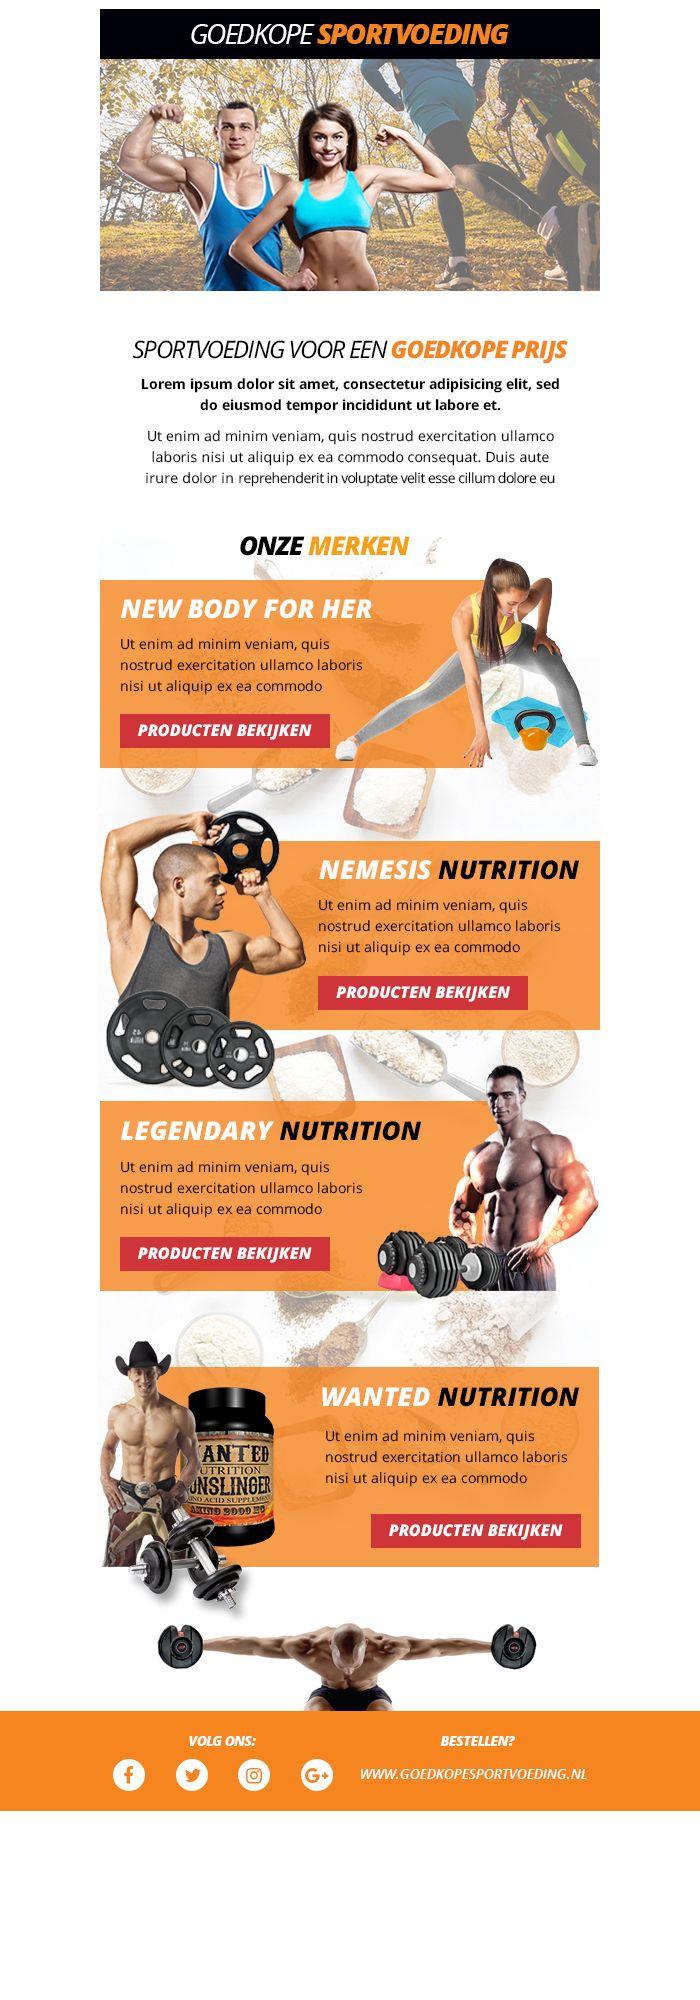 Goedkope sportvoeding newsletter #ontwerp #techniek #newsletter #sport #fit #nieuwsbrief #sportvoeding